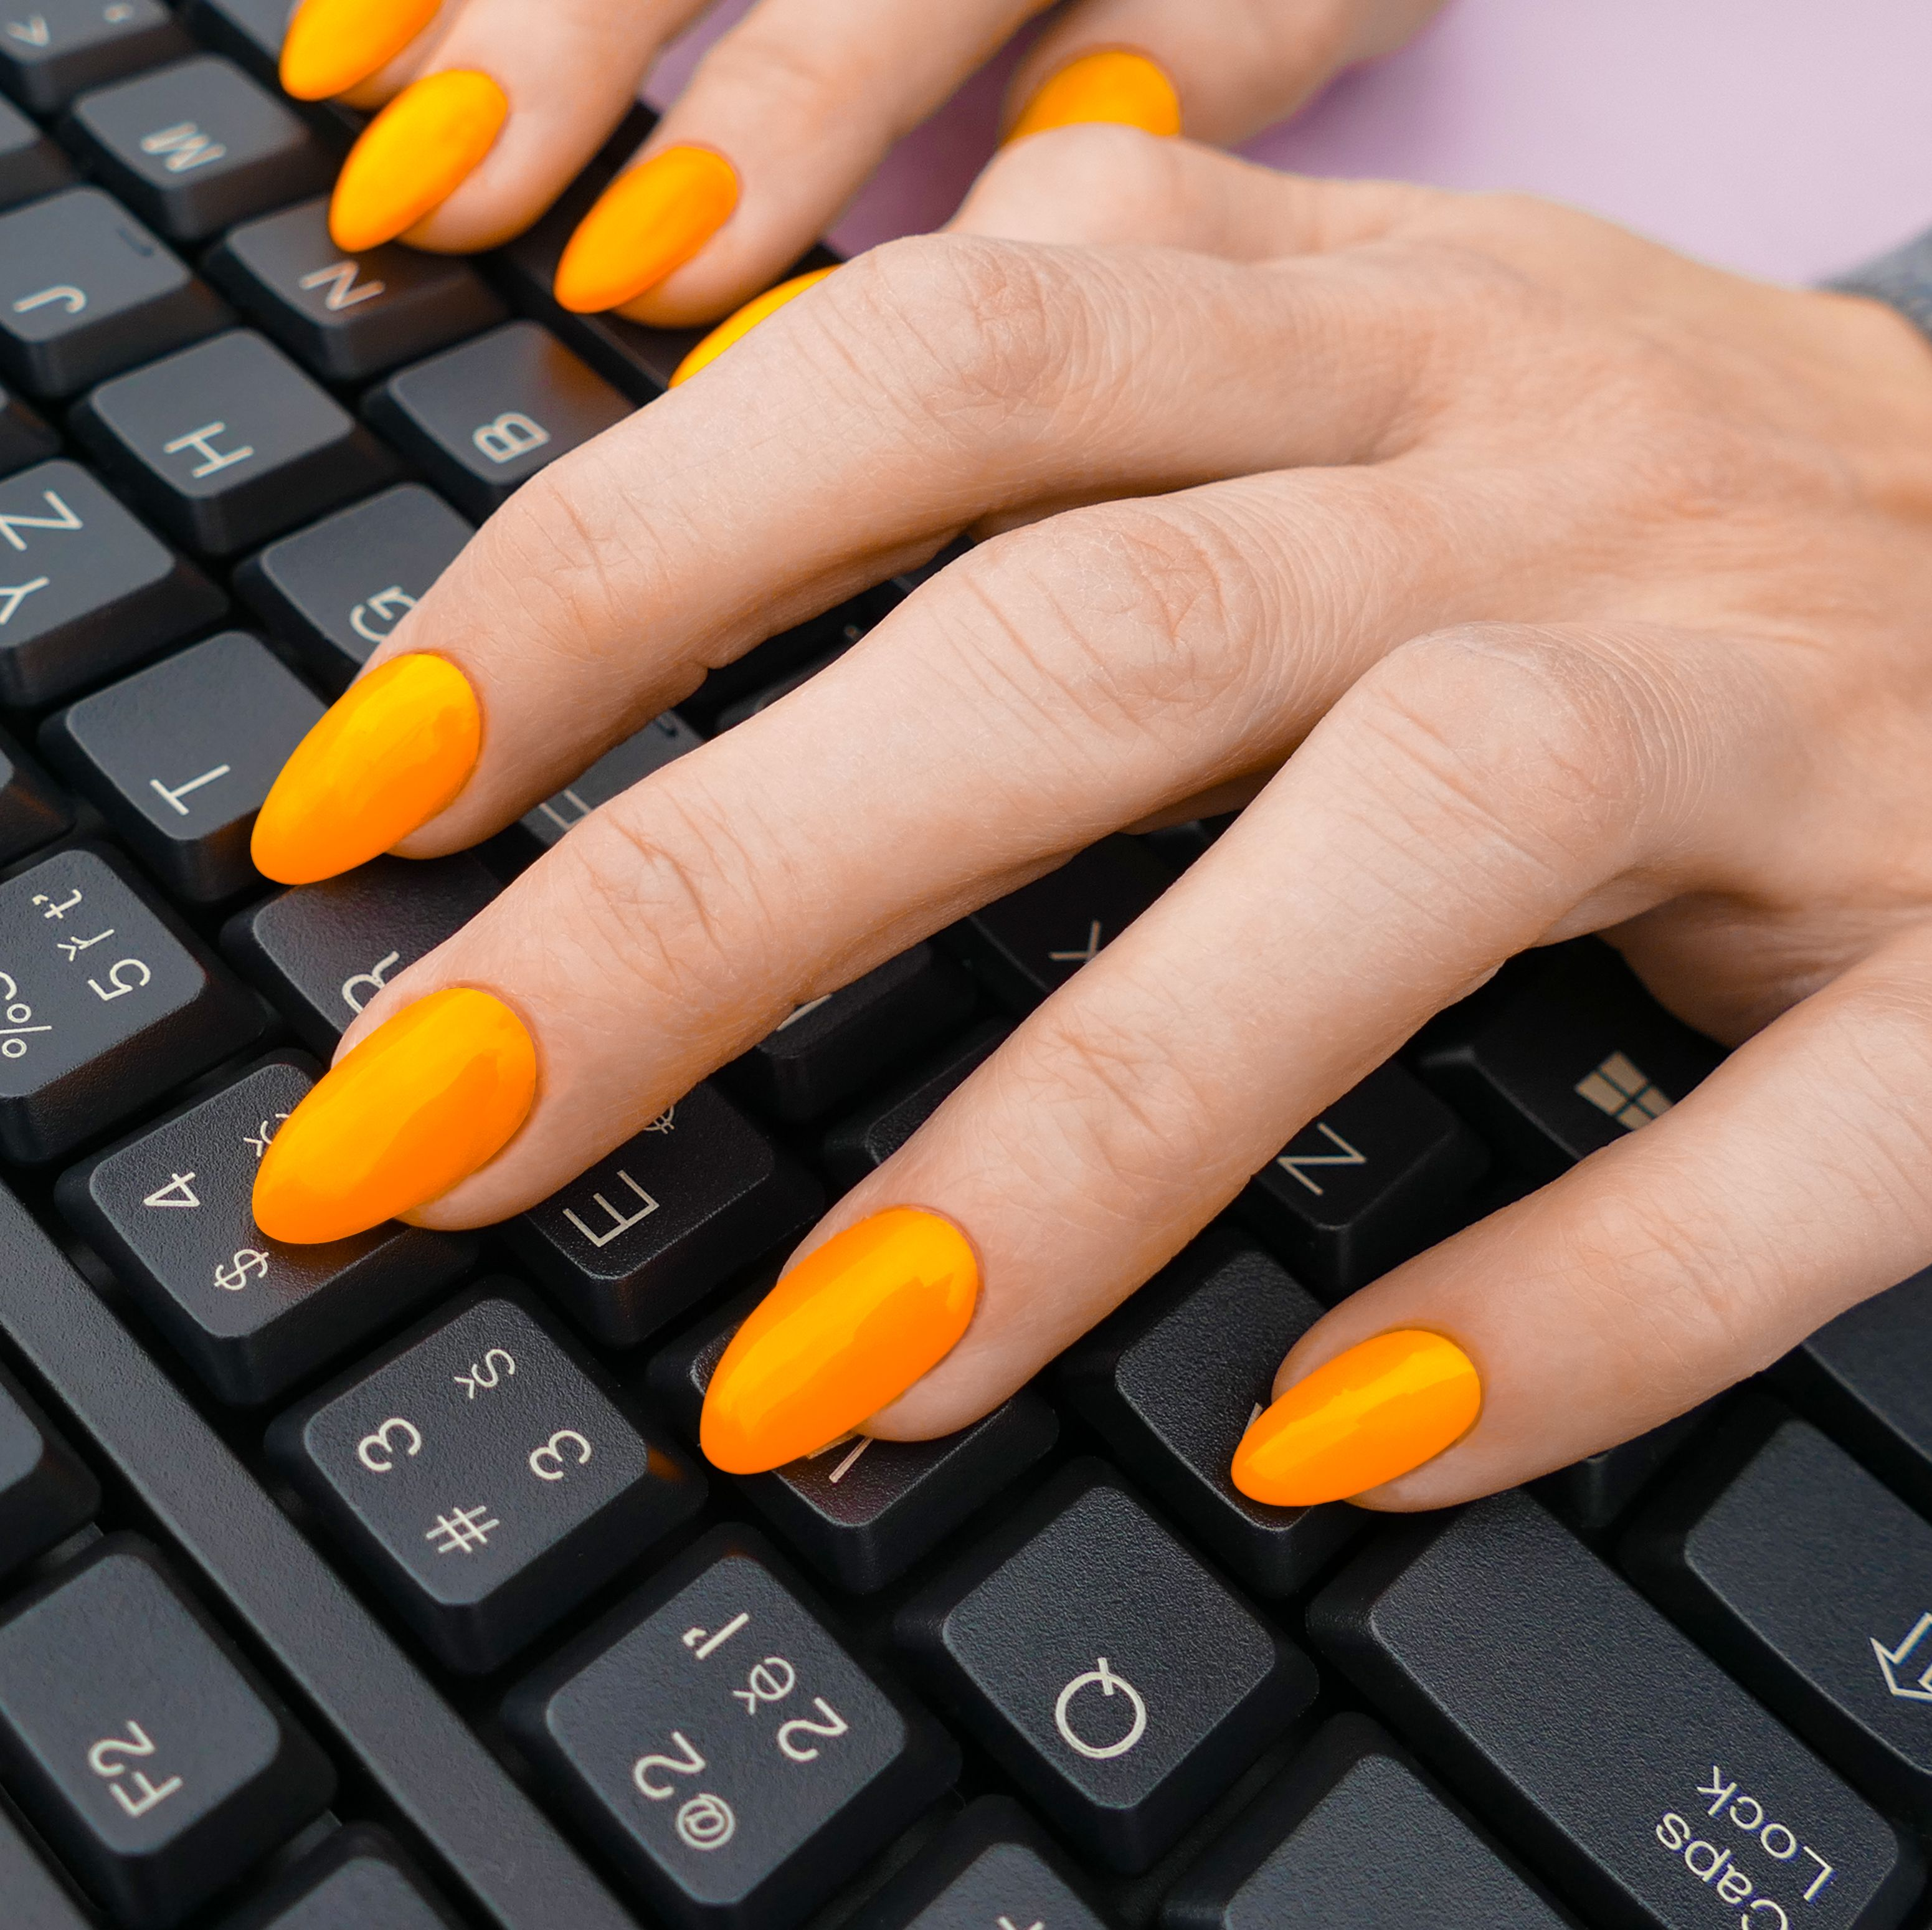 Neonove Barvy Jsou Idealni Volba Na Leto Jednoduse Je Treba Mit Nehty Oslnive Jako Slunecni Paprsky Napriklad Tento Odstin Gel Orange Nails Nails Hand Art